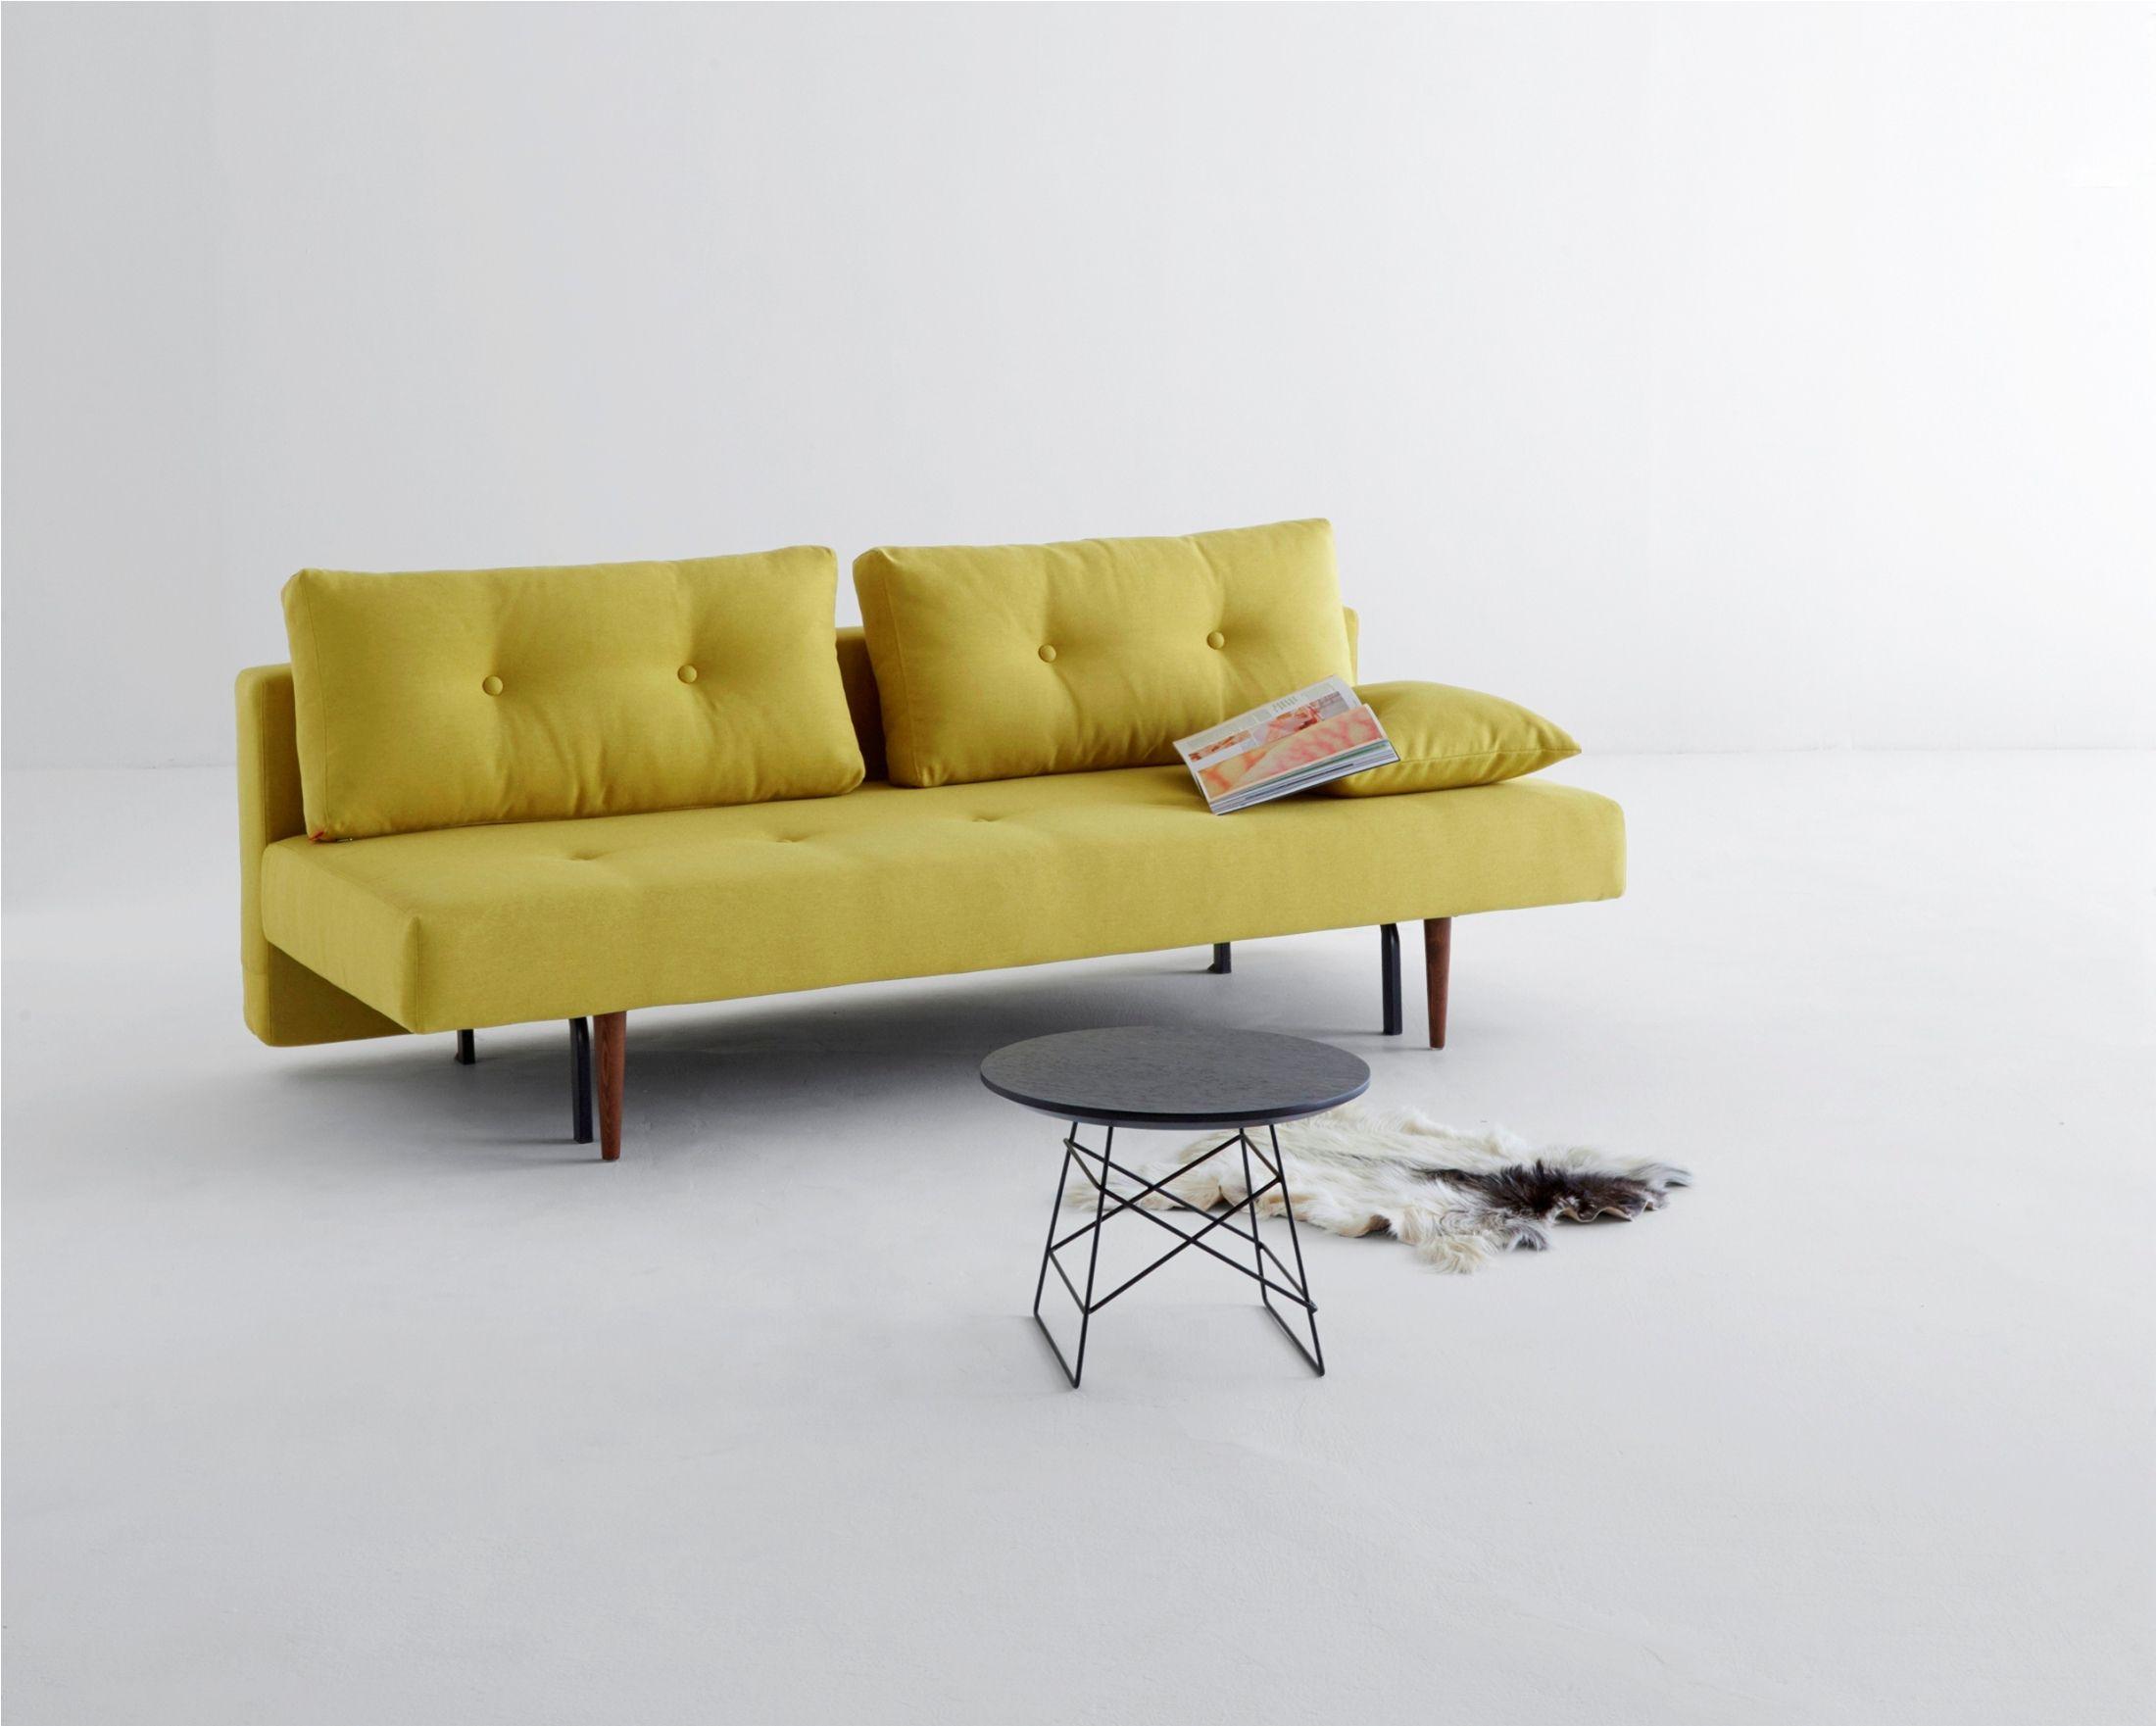 Recast Sofa Bed In Soft Mustard By Innovation